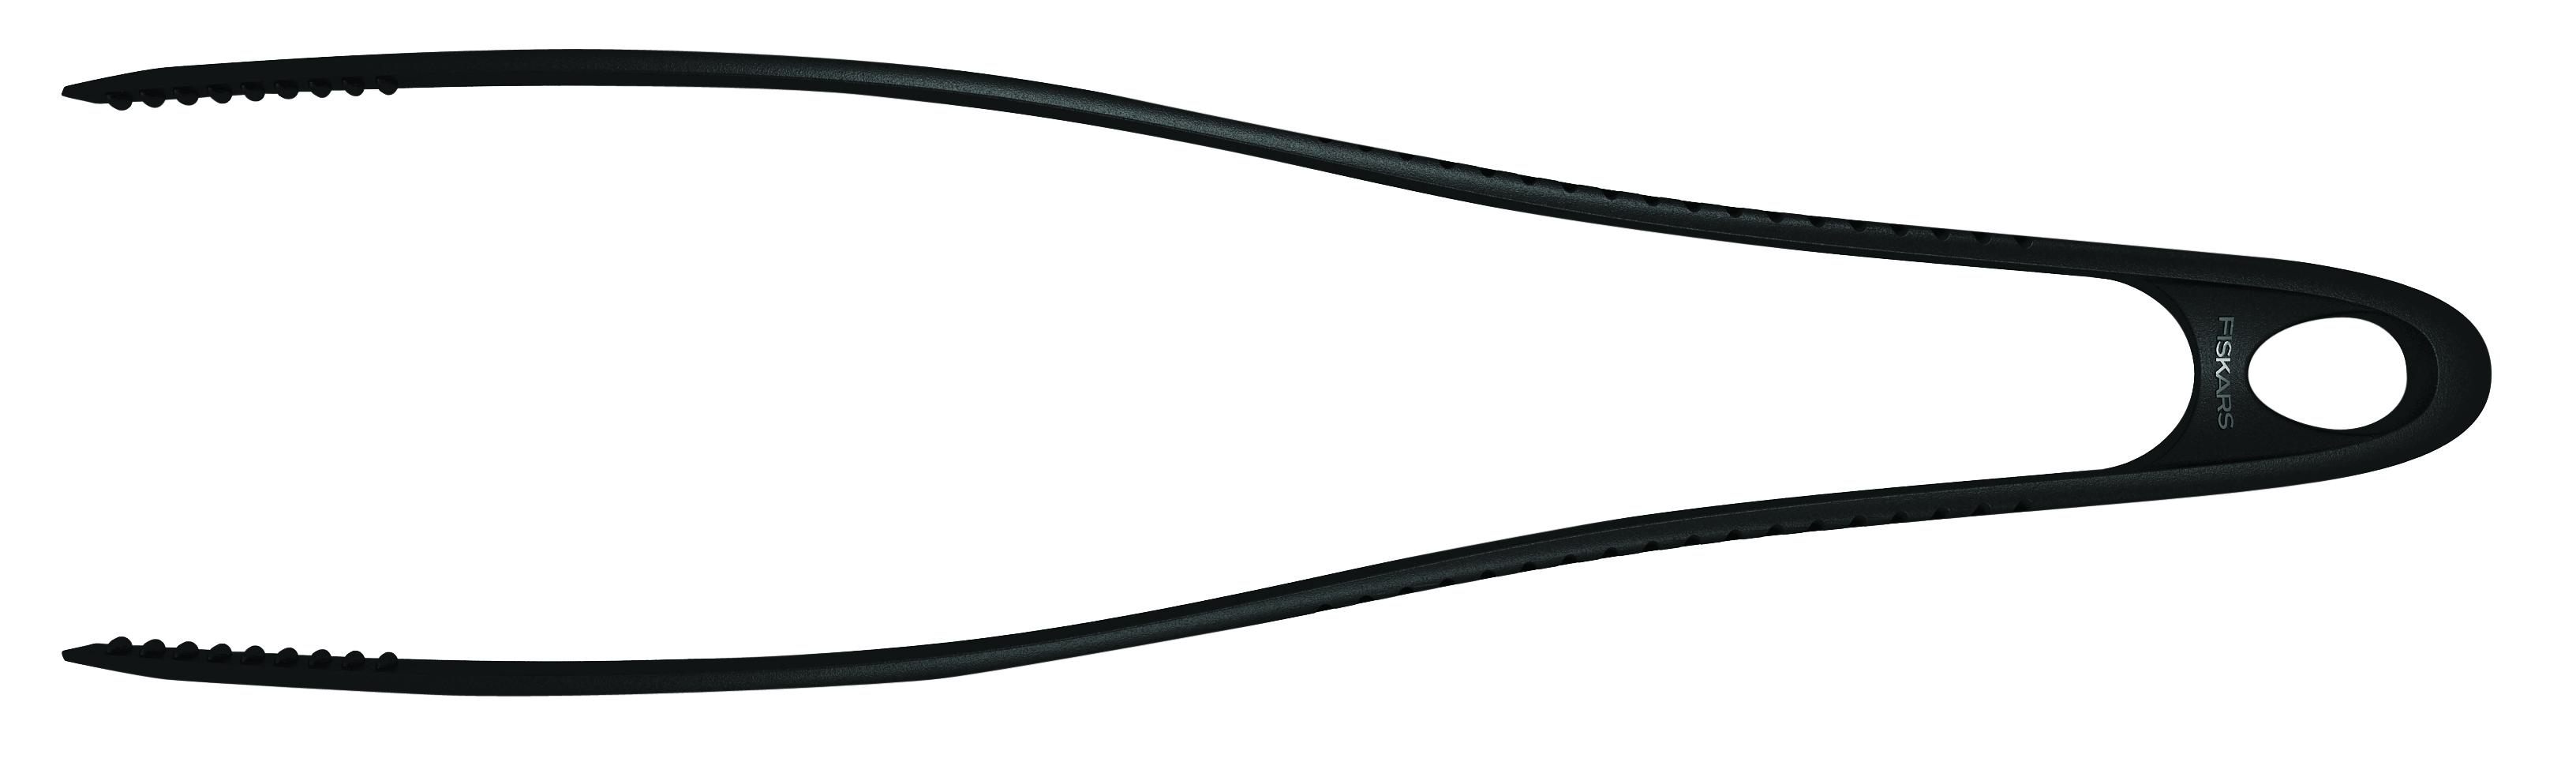 Essential Tång/pincett 29 cm